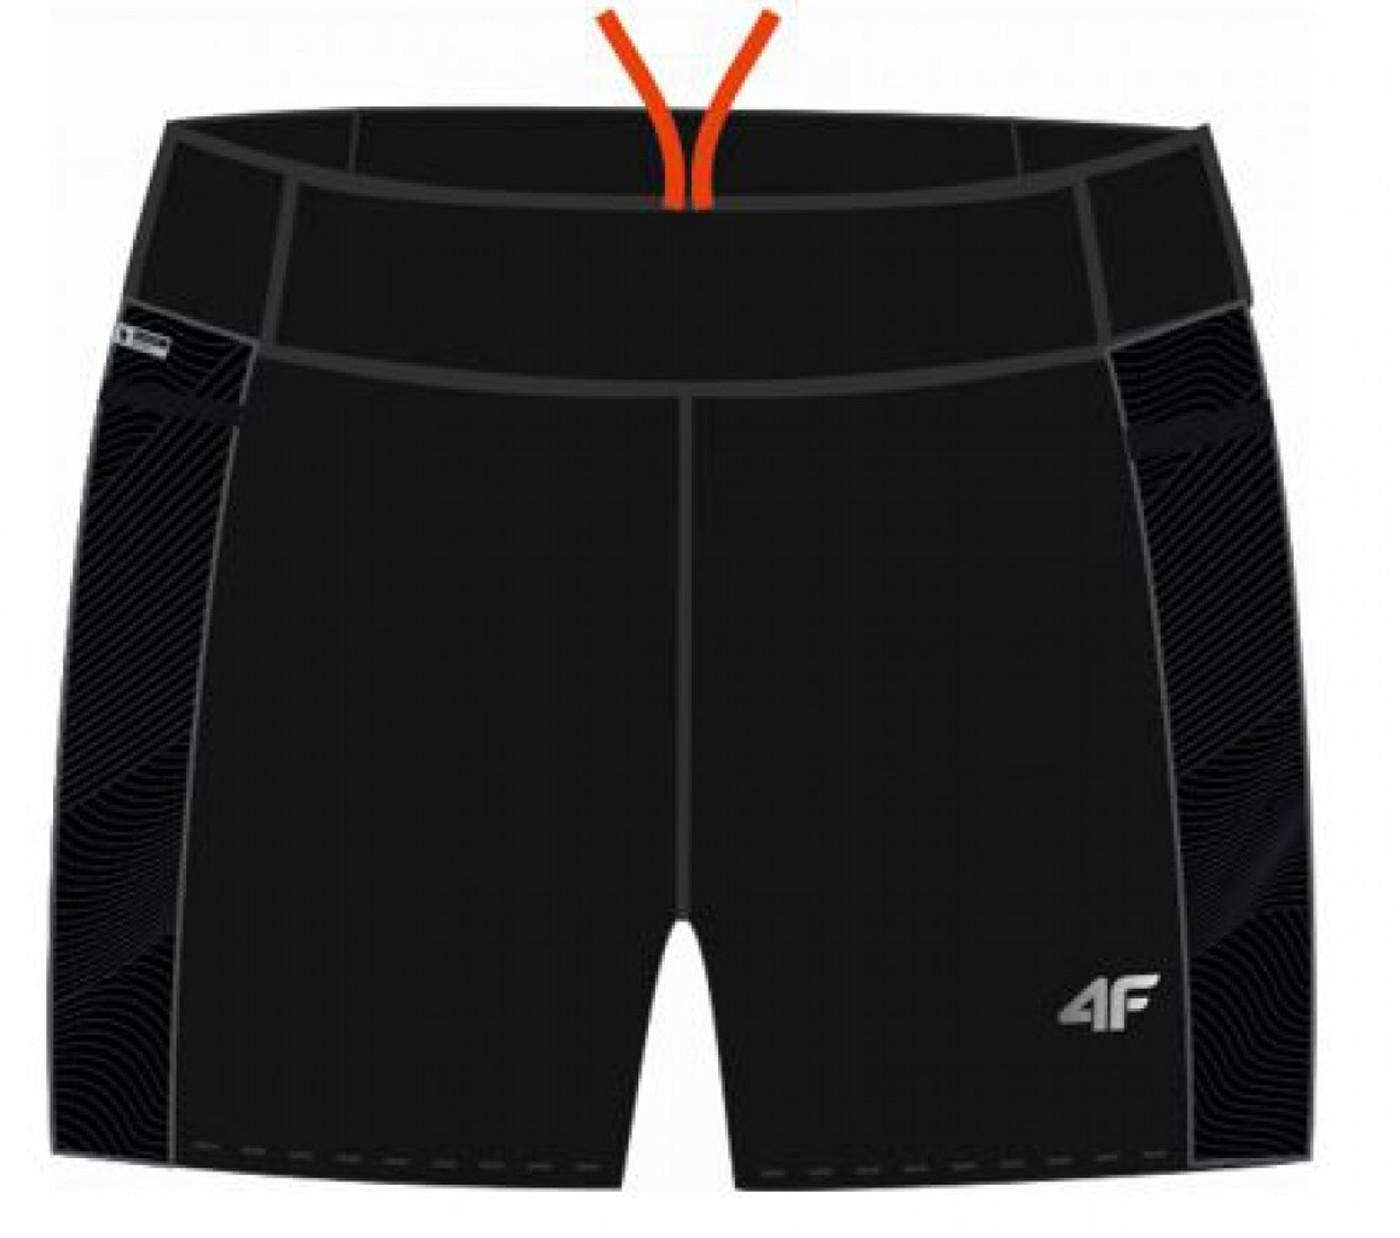 4F Short Tight - Damen